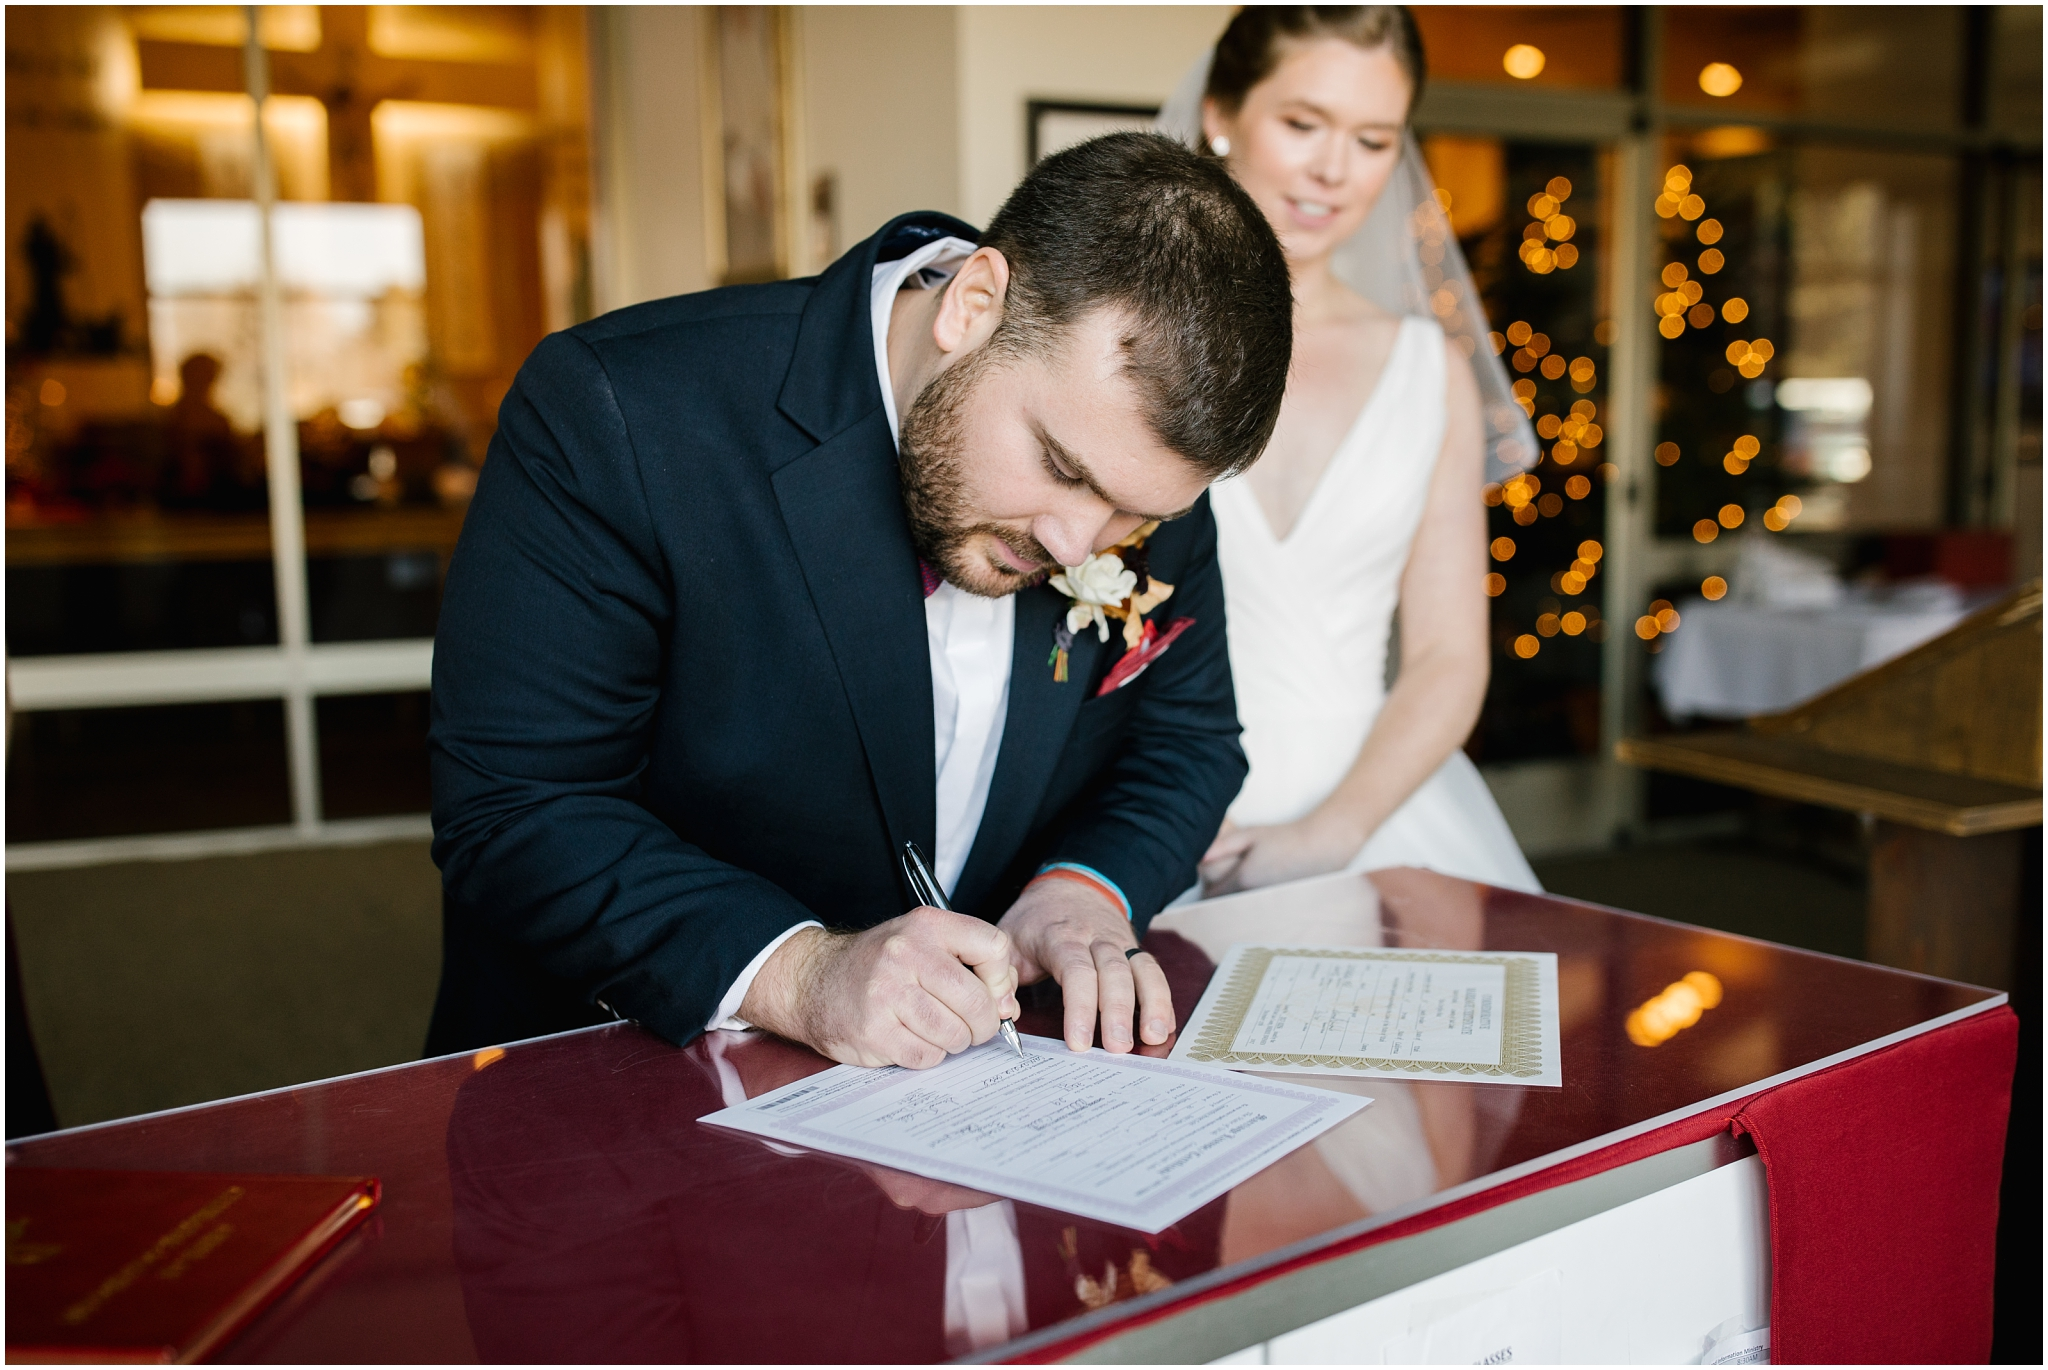 CN-Wedding-159_Lizzie-B-Imagery-Utah-Wedding-Photographer-Blessed-Sacrament-Catholic-Church-Sandy-Utah-The-Blended-Table-Salt-Lake-City.jpg